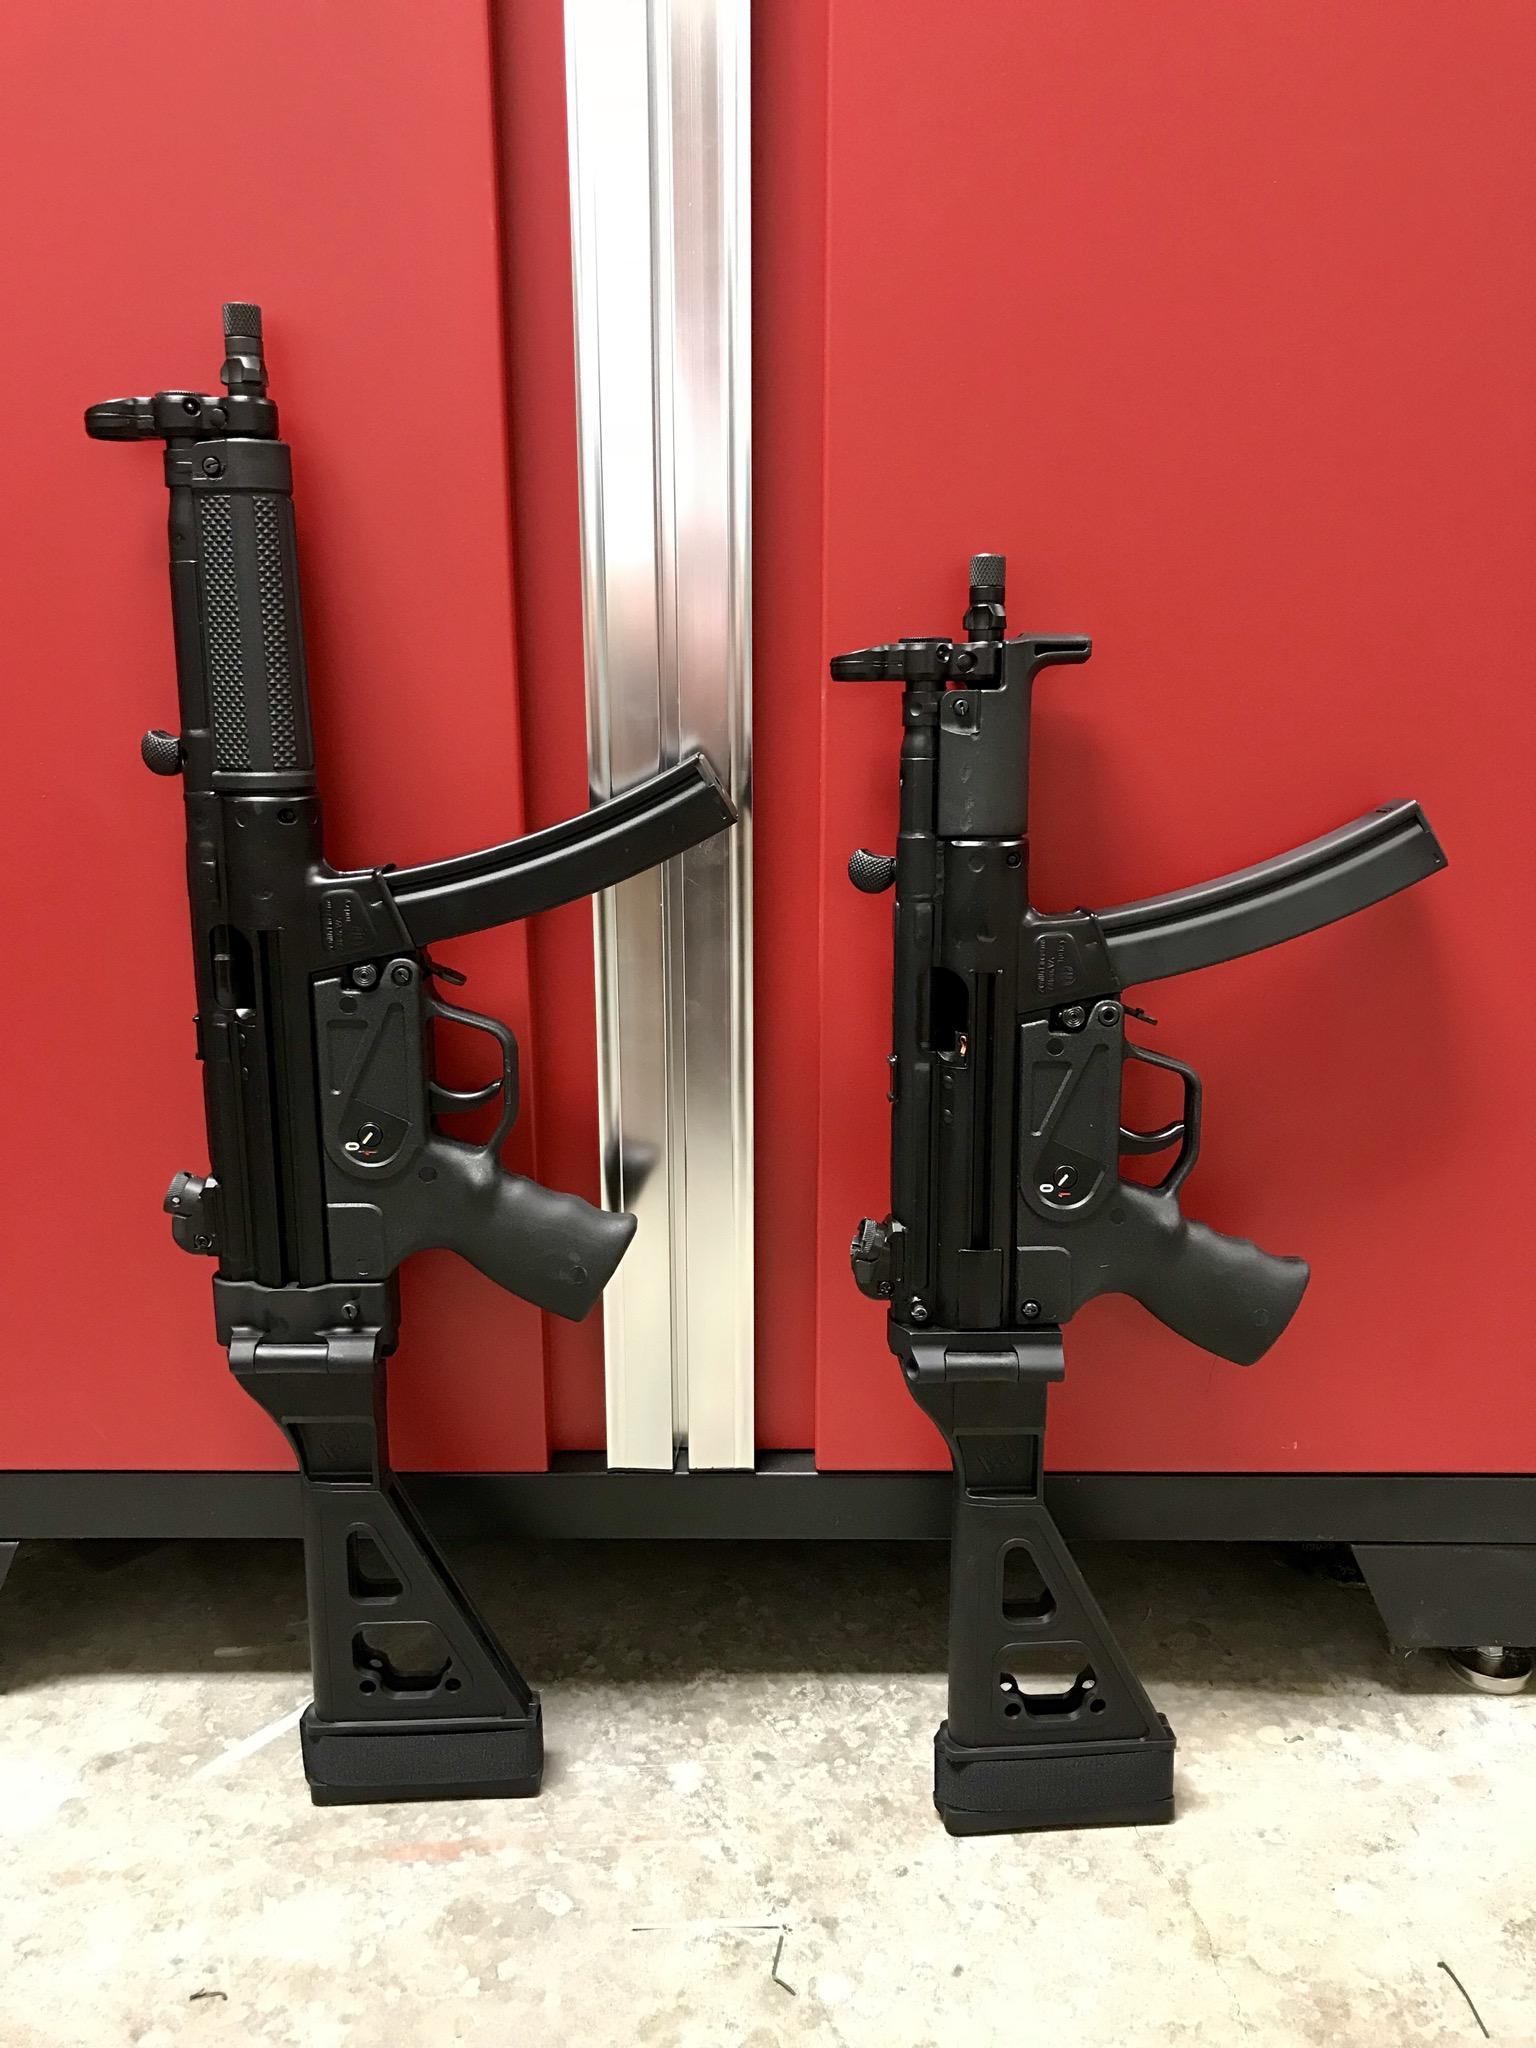 Are Zenith Z-5RS Pistol's still available?-5f3ee772-e19f-4dde-af90-ff8b29bdd529_1526236908118.jpeg